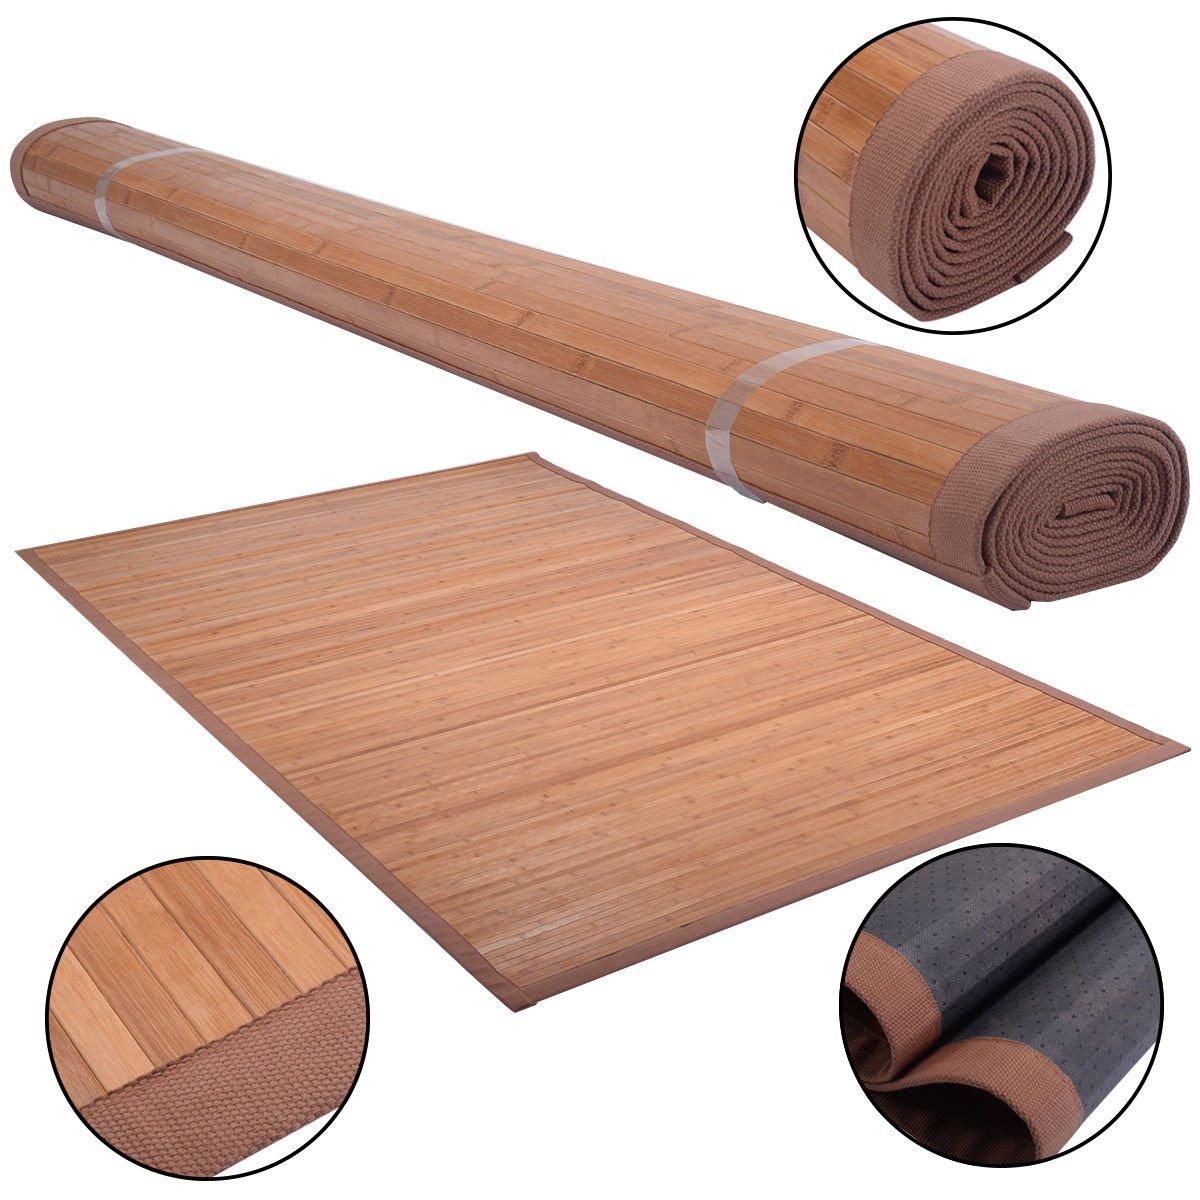 Nature 5/' X 8/' Bamboo Area Rug Floor Carpet Bamboo Wood Indoor Outdoor New